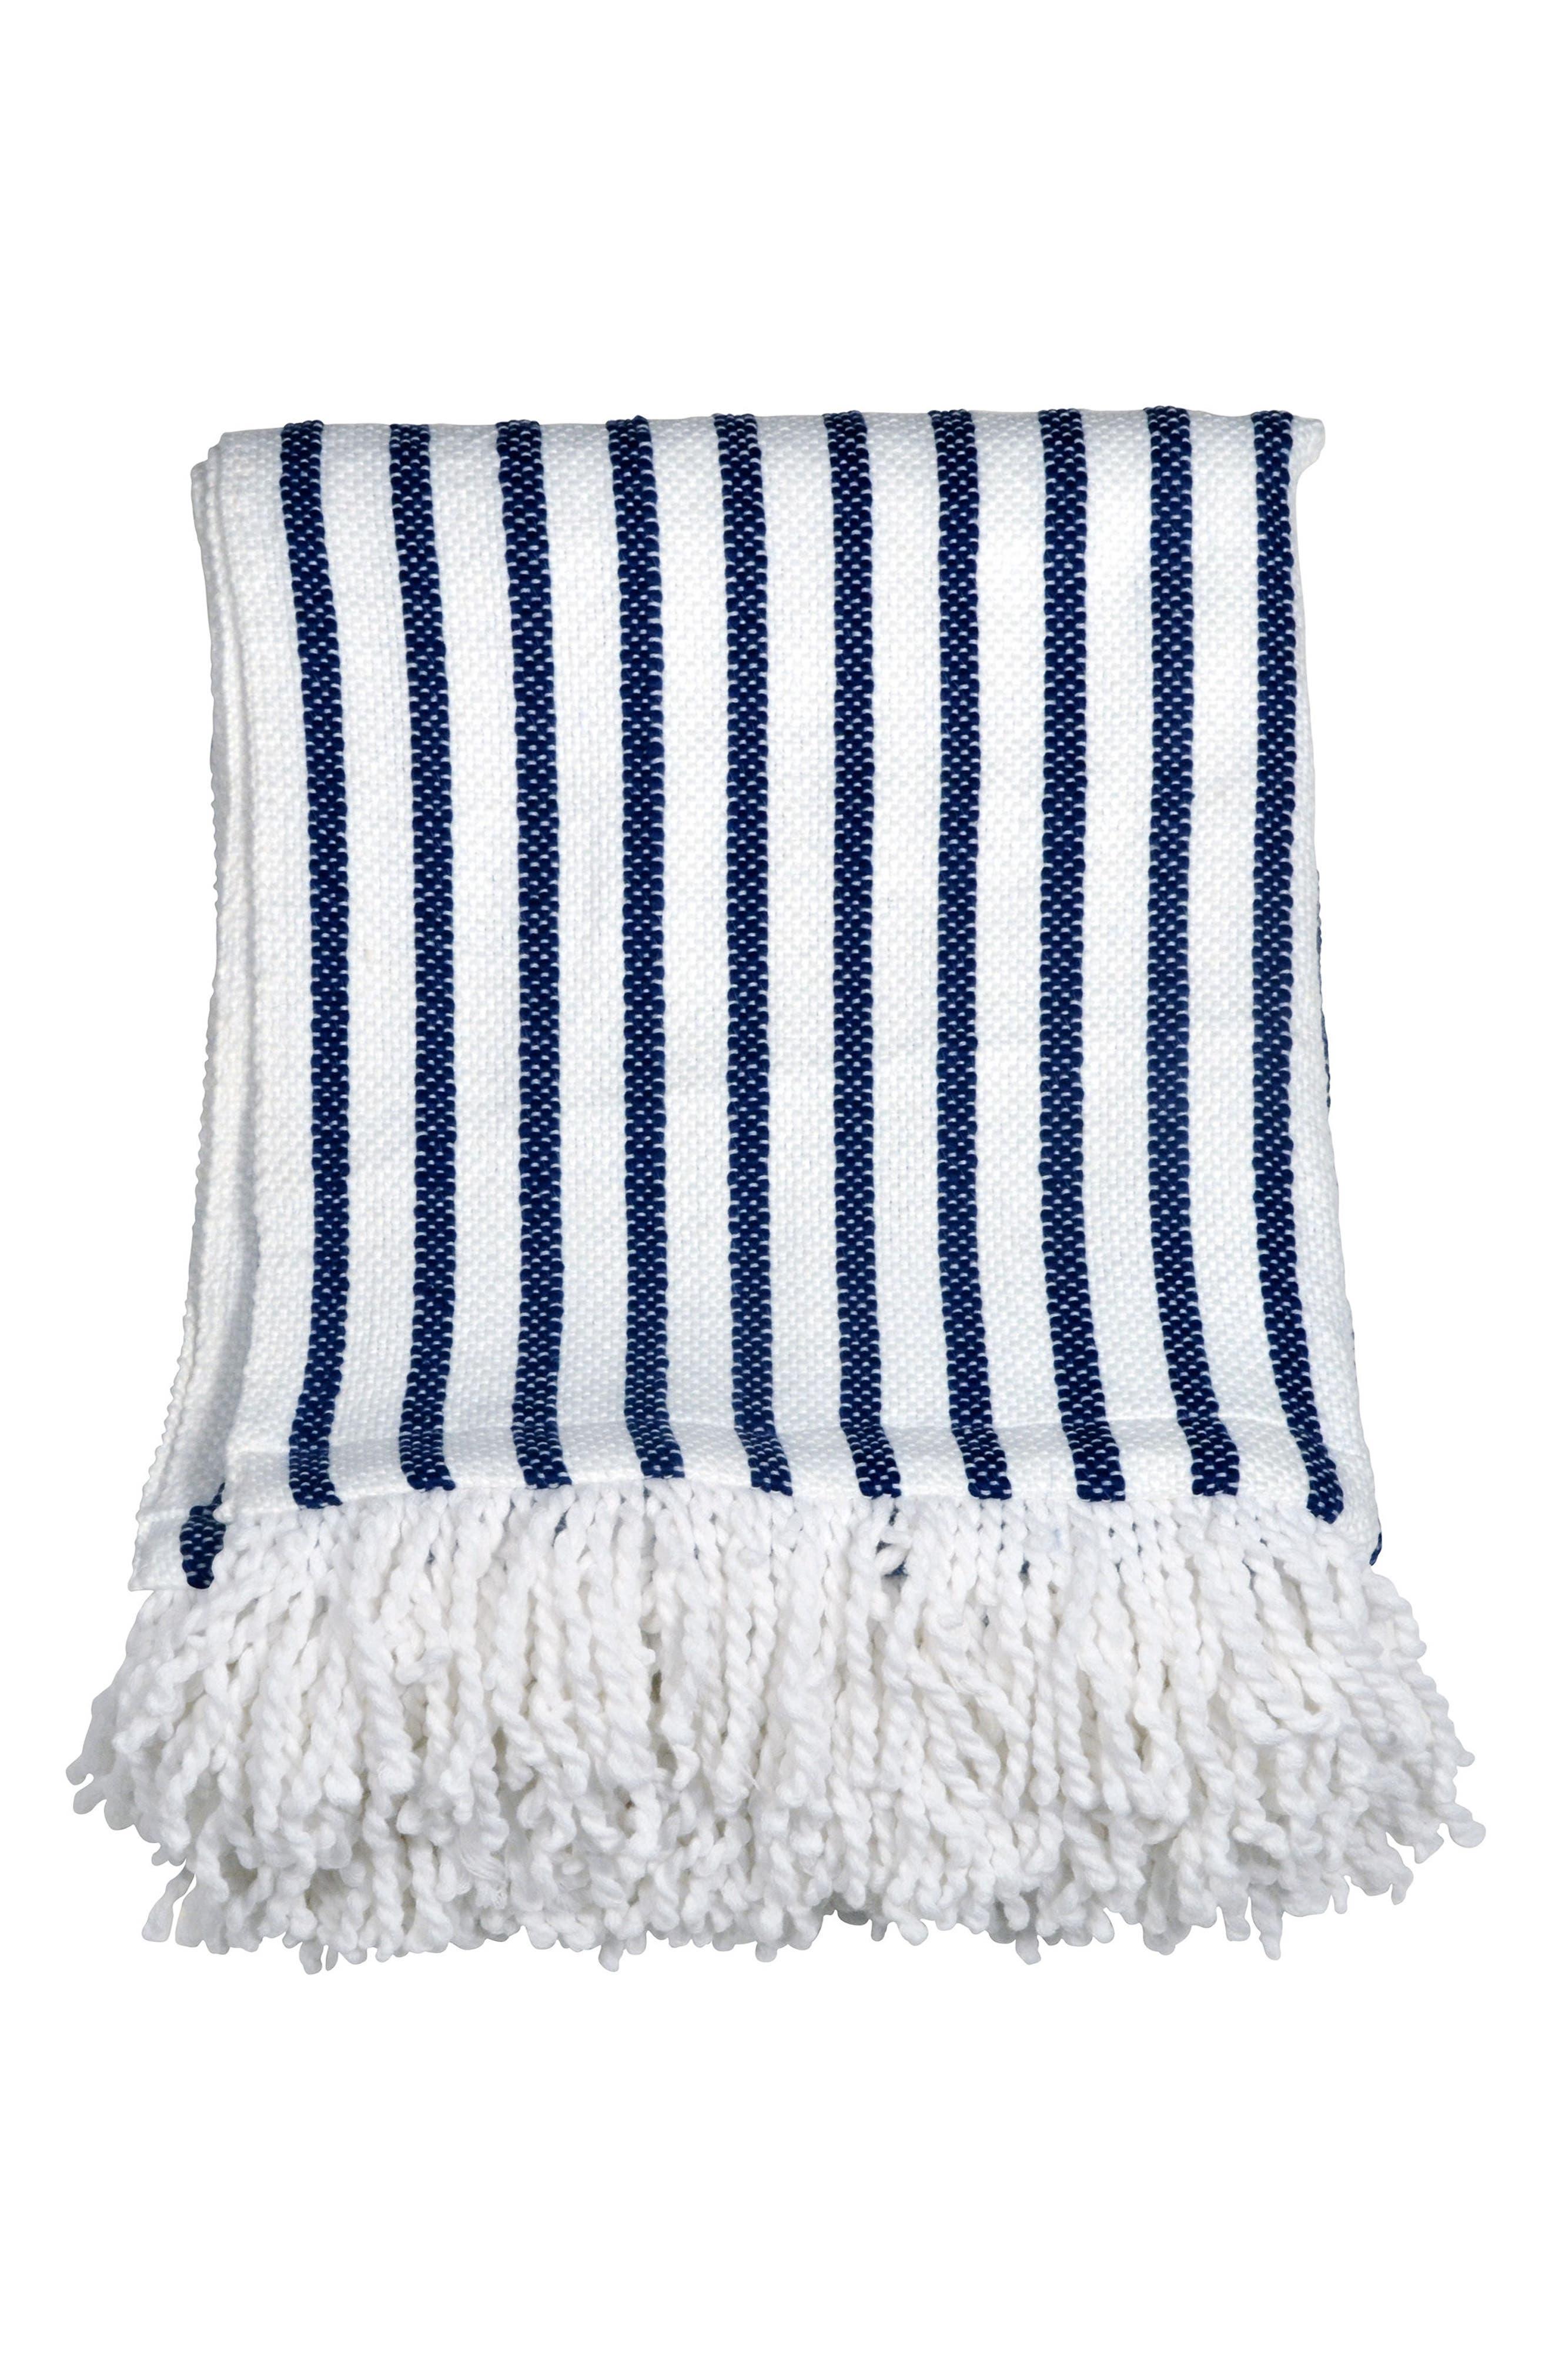 Main Image - Peri Home Fringe Throw Blanket